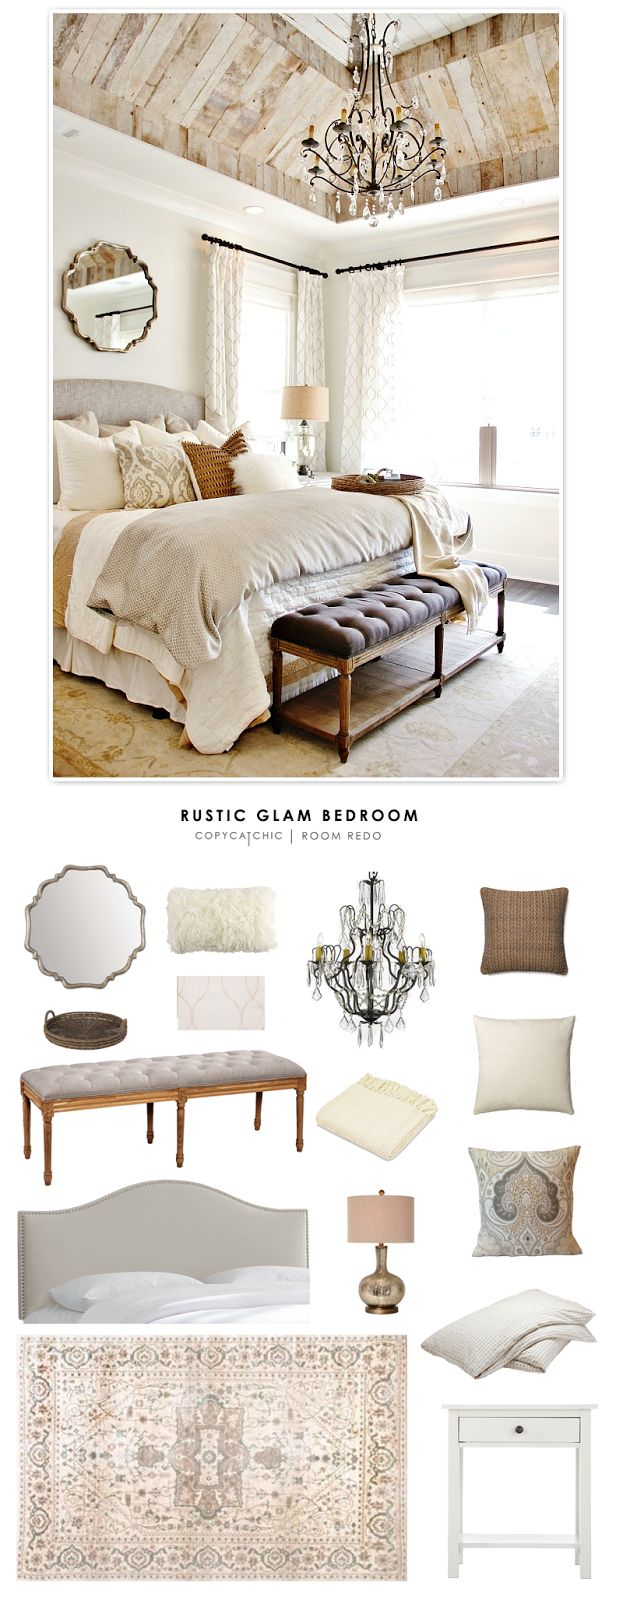 best bedrooms floor plans images on pinterest coastal